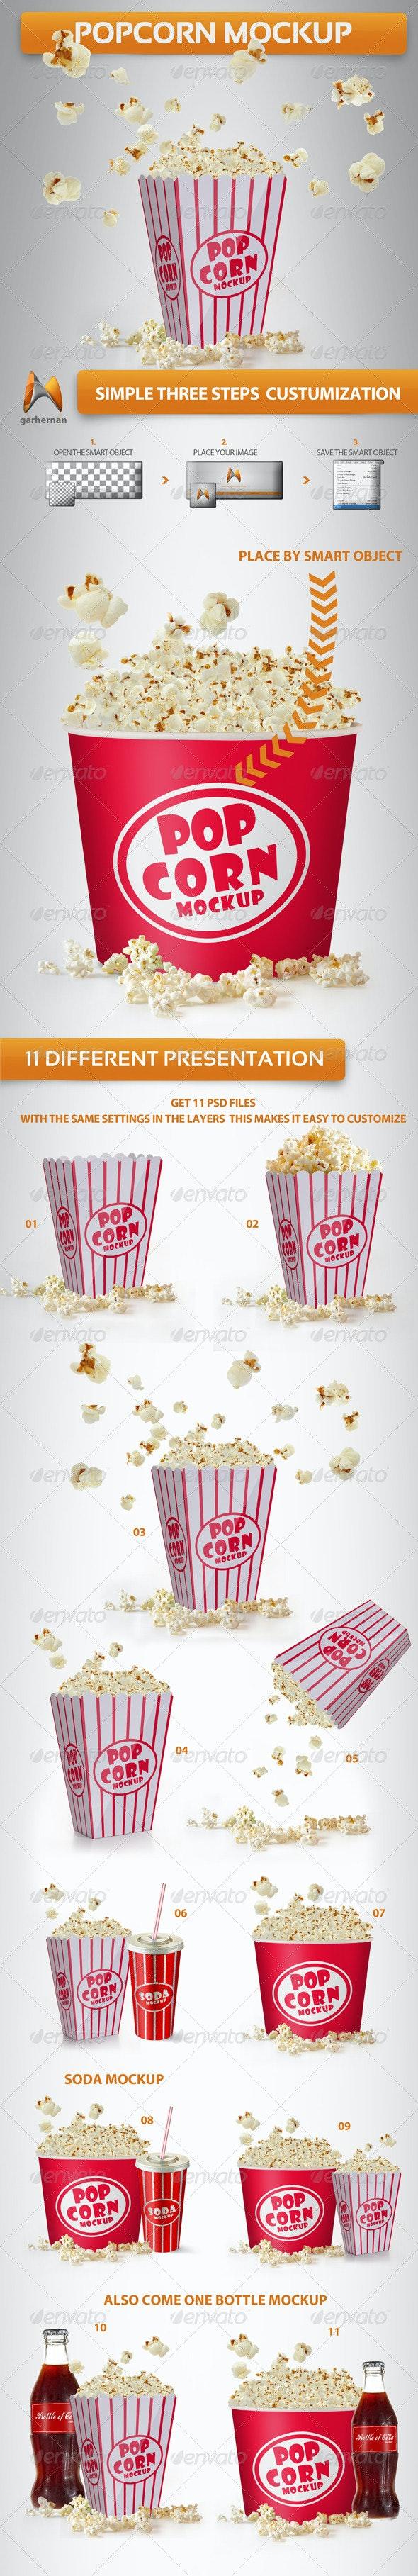 Popcorn Mockup - Food and Drink Packaging